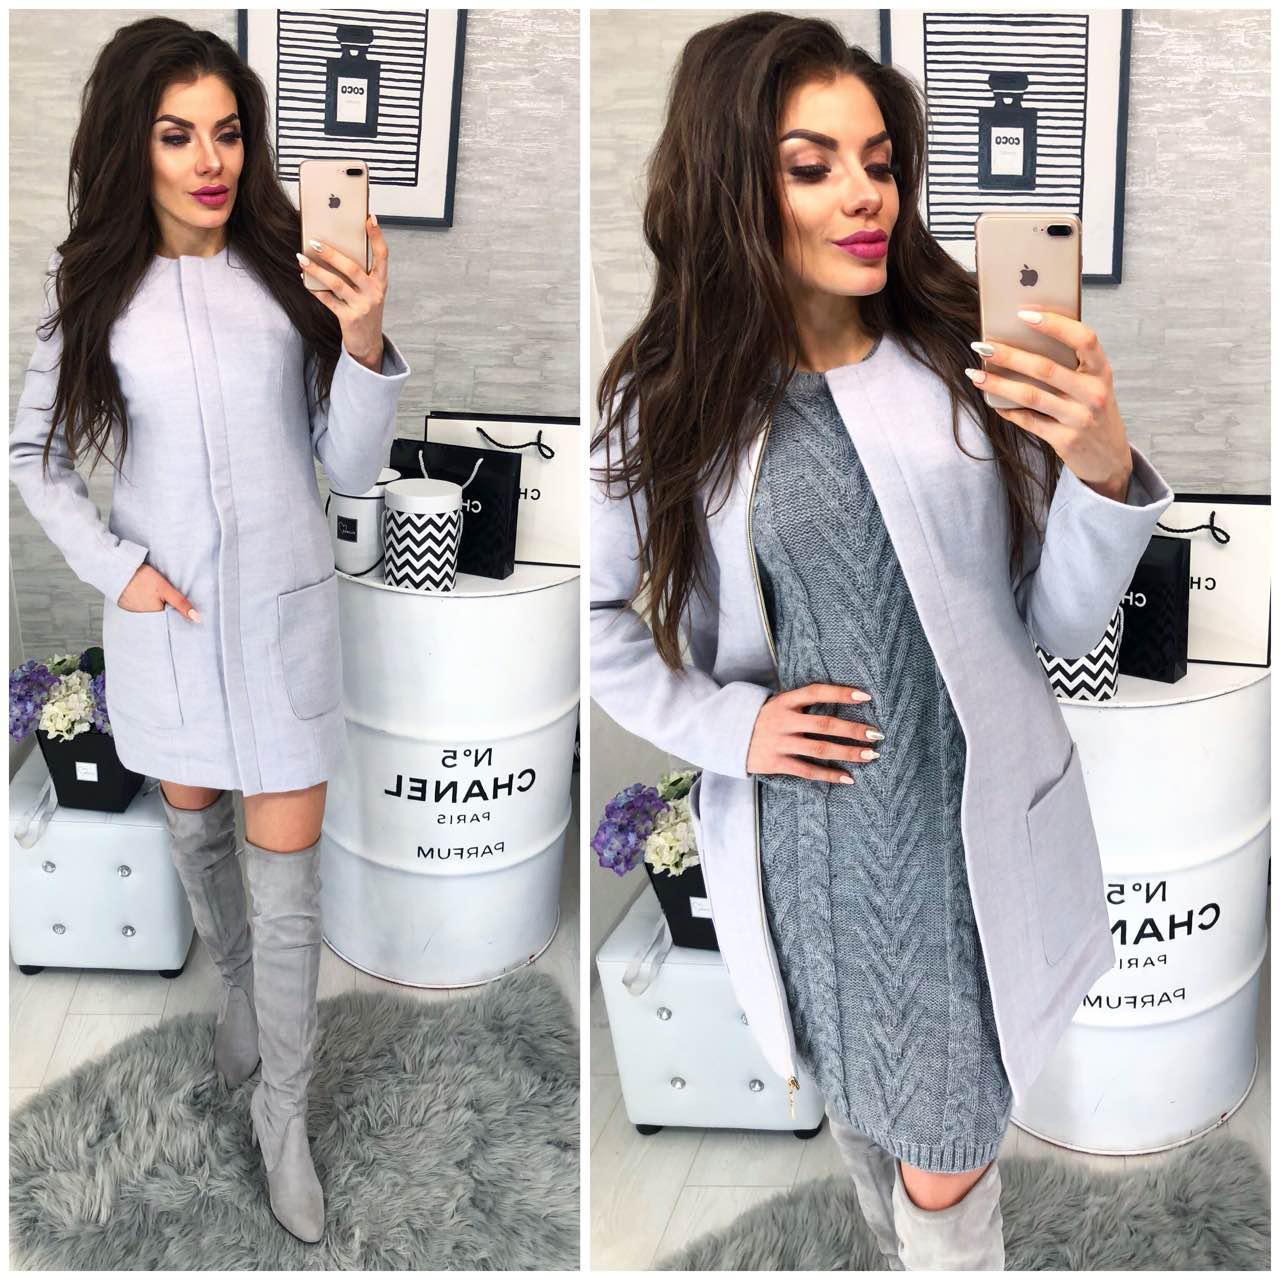 Пальто кашемір жіноче, модель 808, в 4 -х кольорах